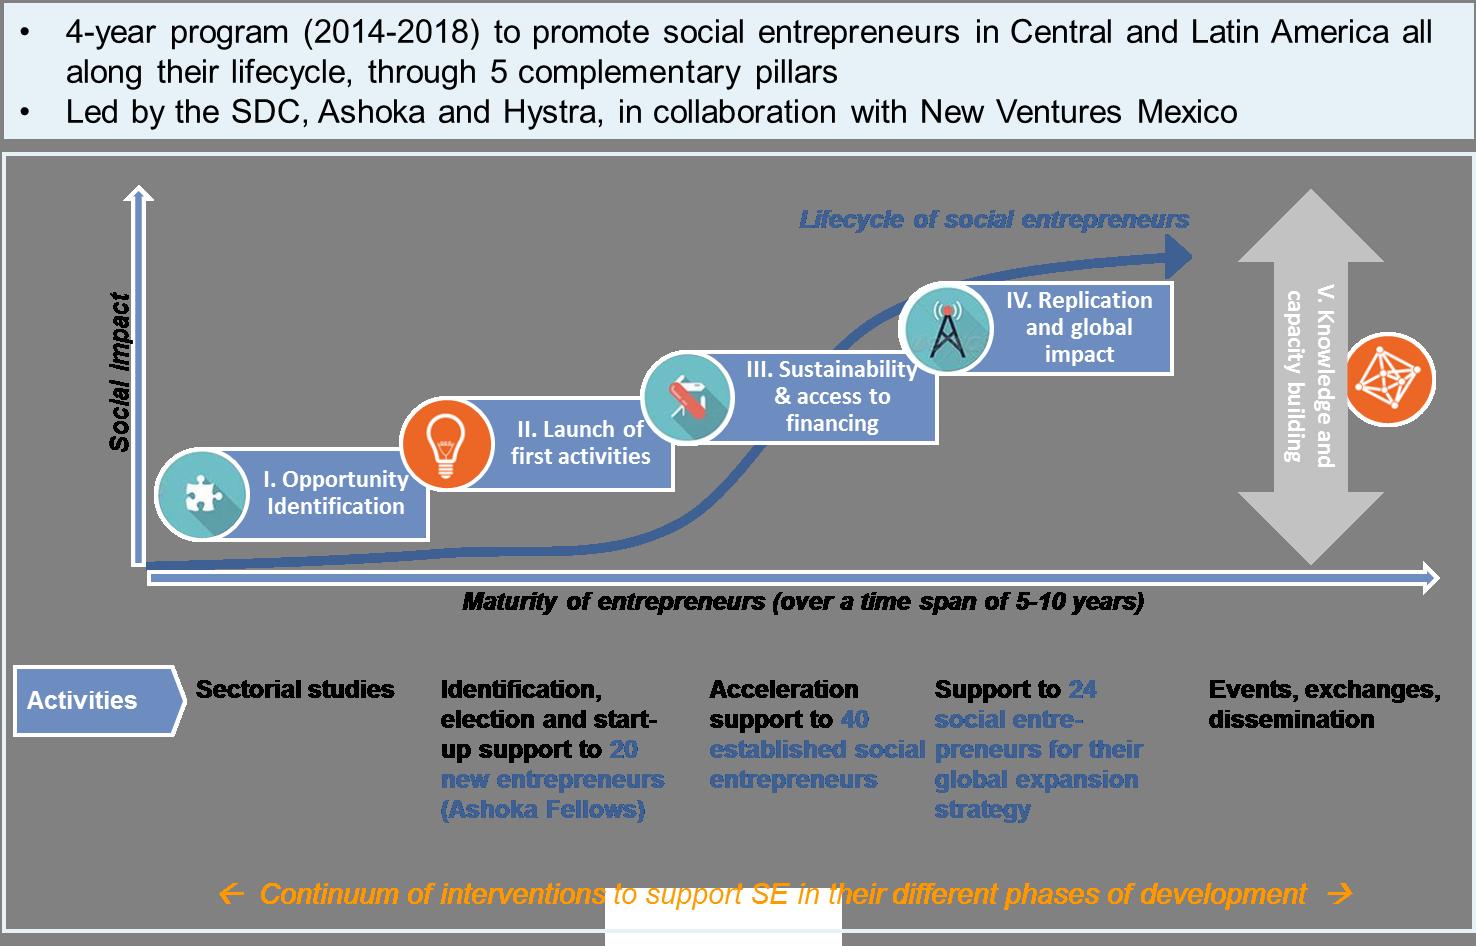 201610 SDC program overview